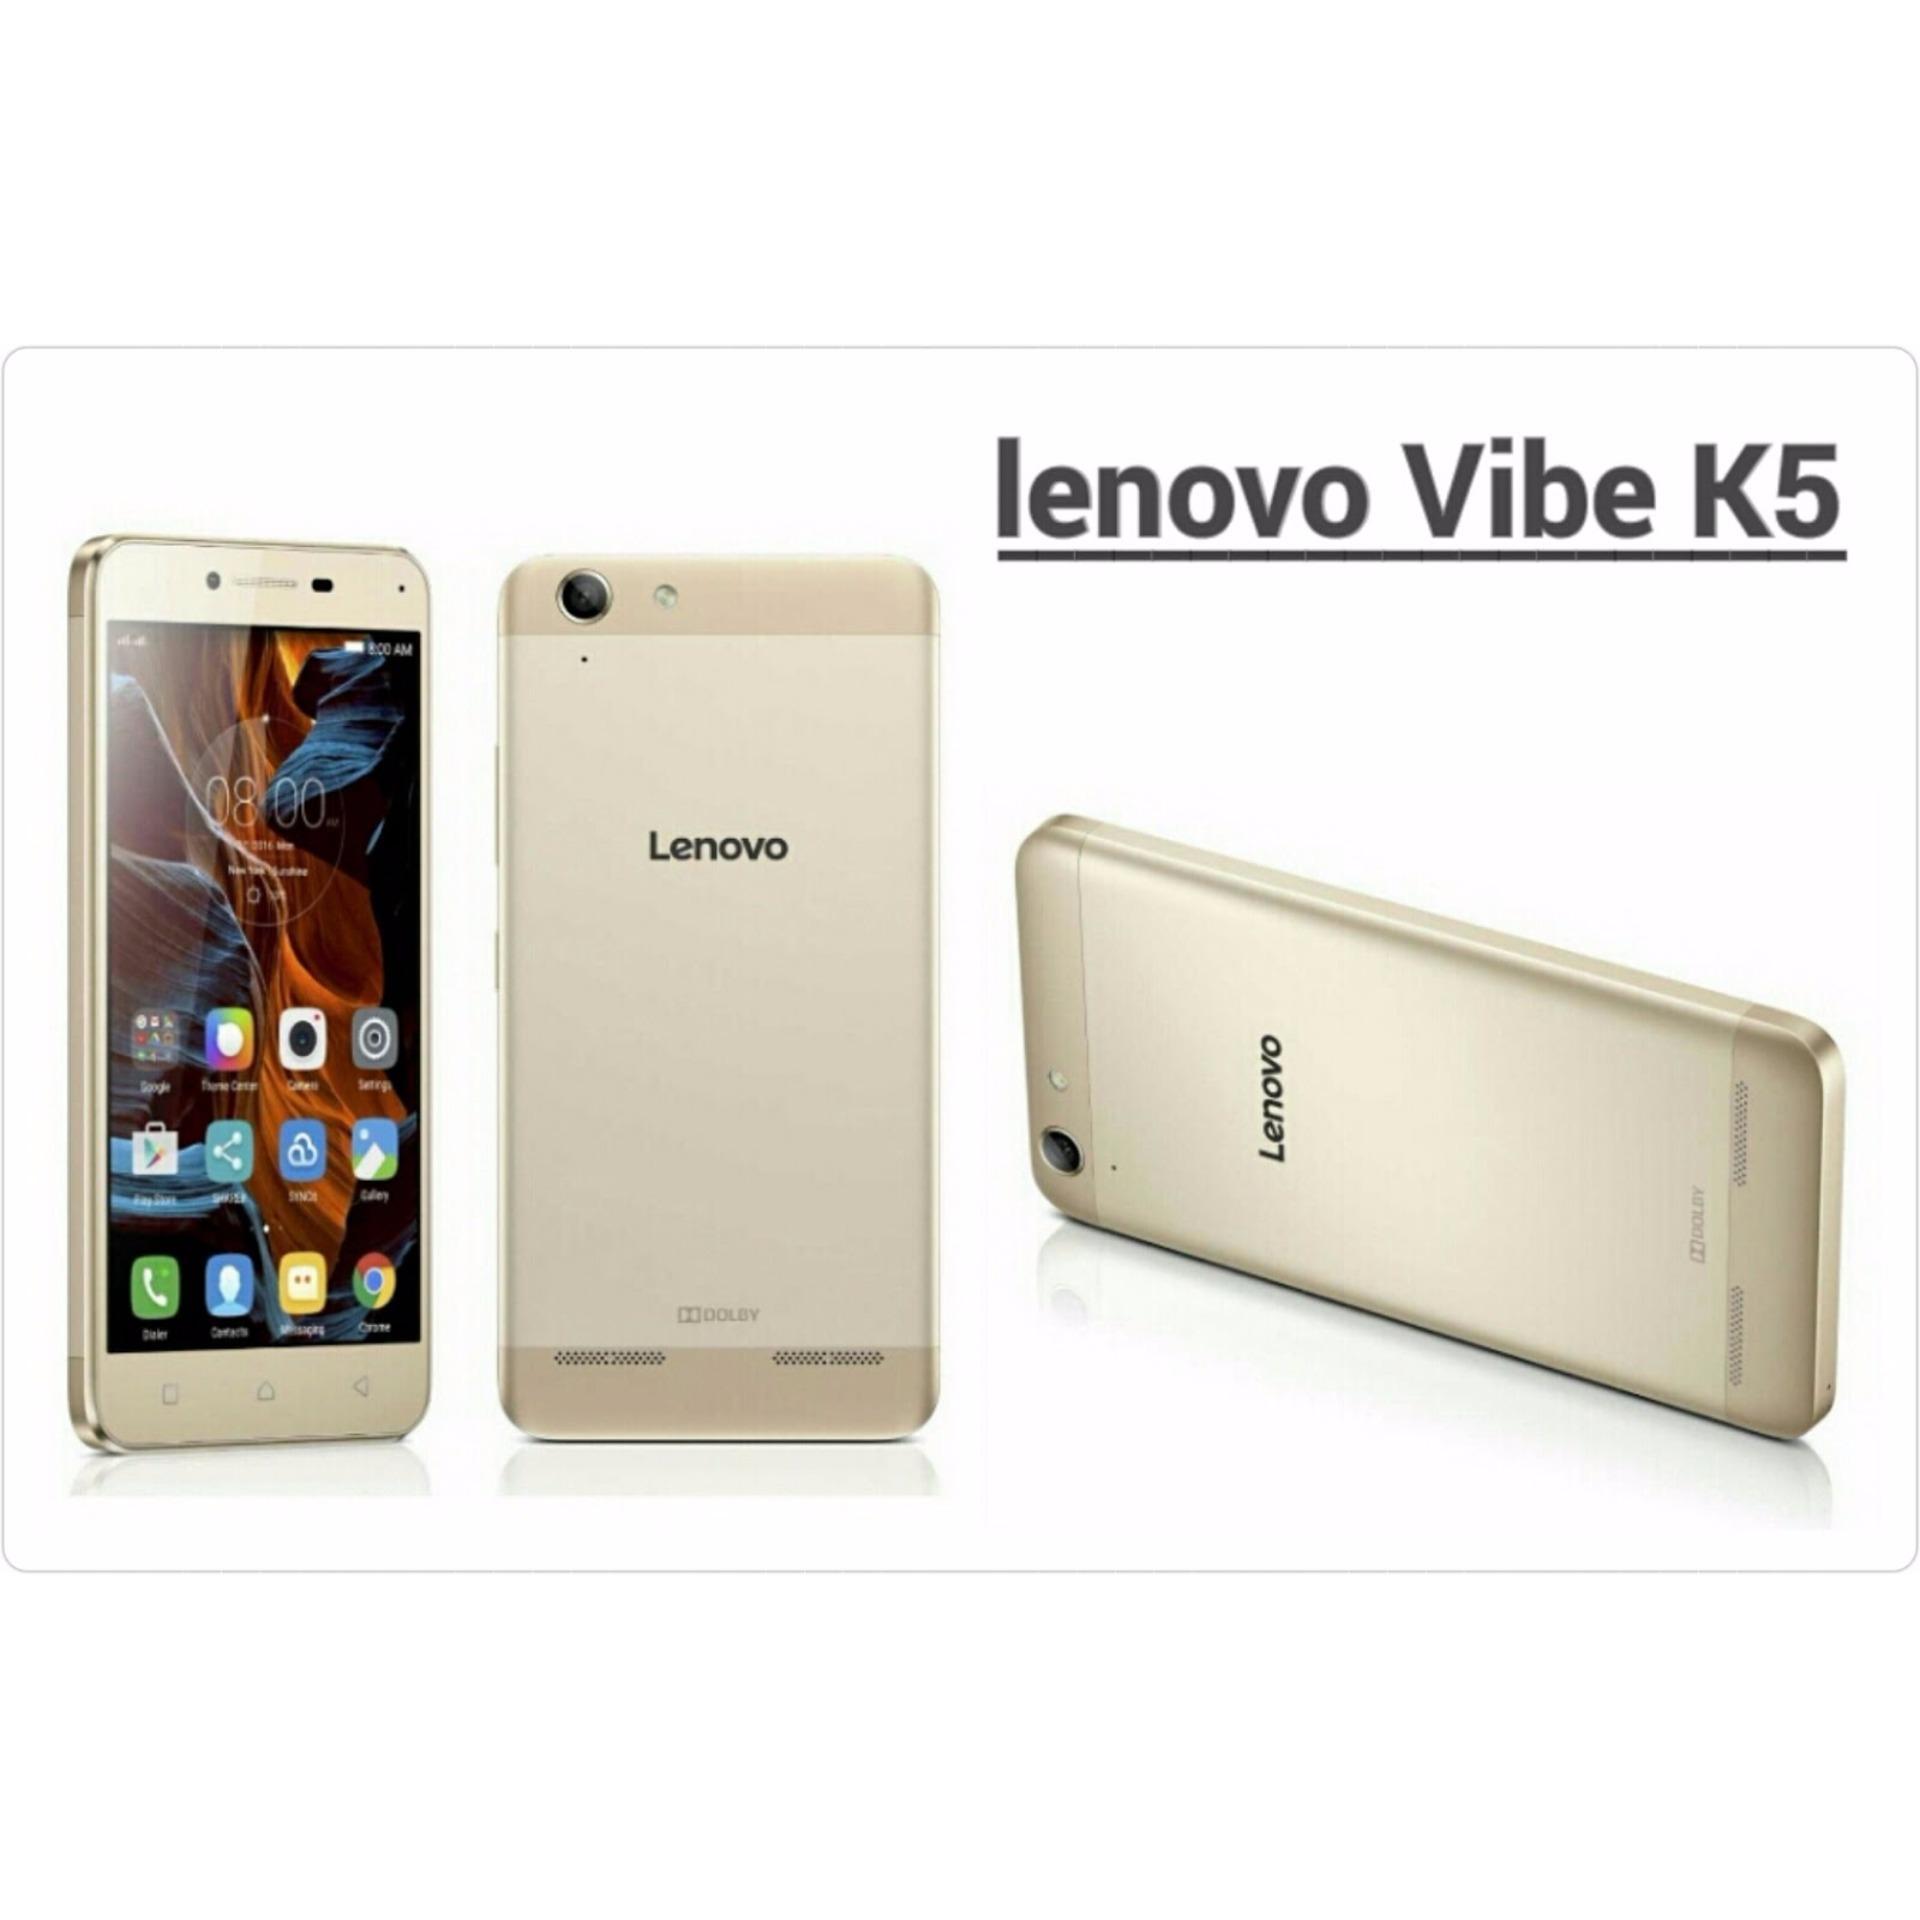 Eshop Checker Hp Lenovo Vibe K5 2 16gb Bonus Anti Gores Garansi P1 Turbo 32gb Abu Resmi